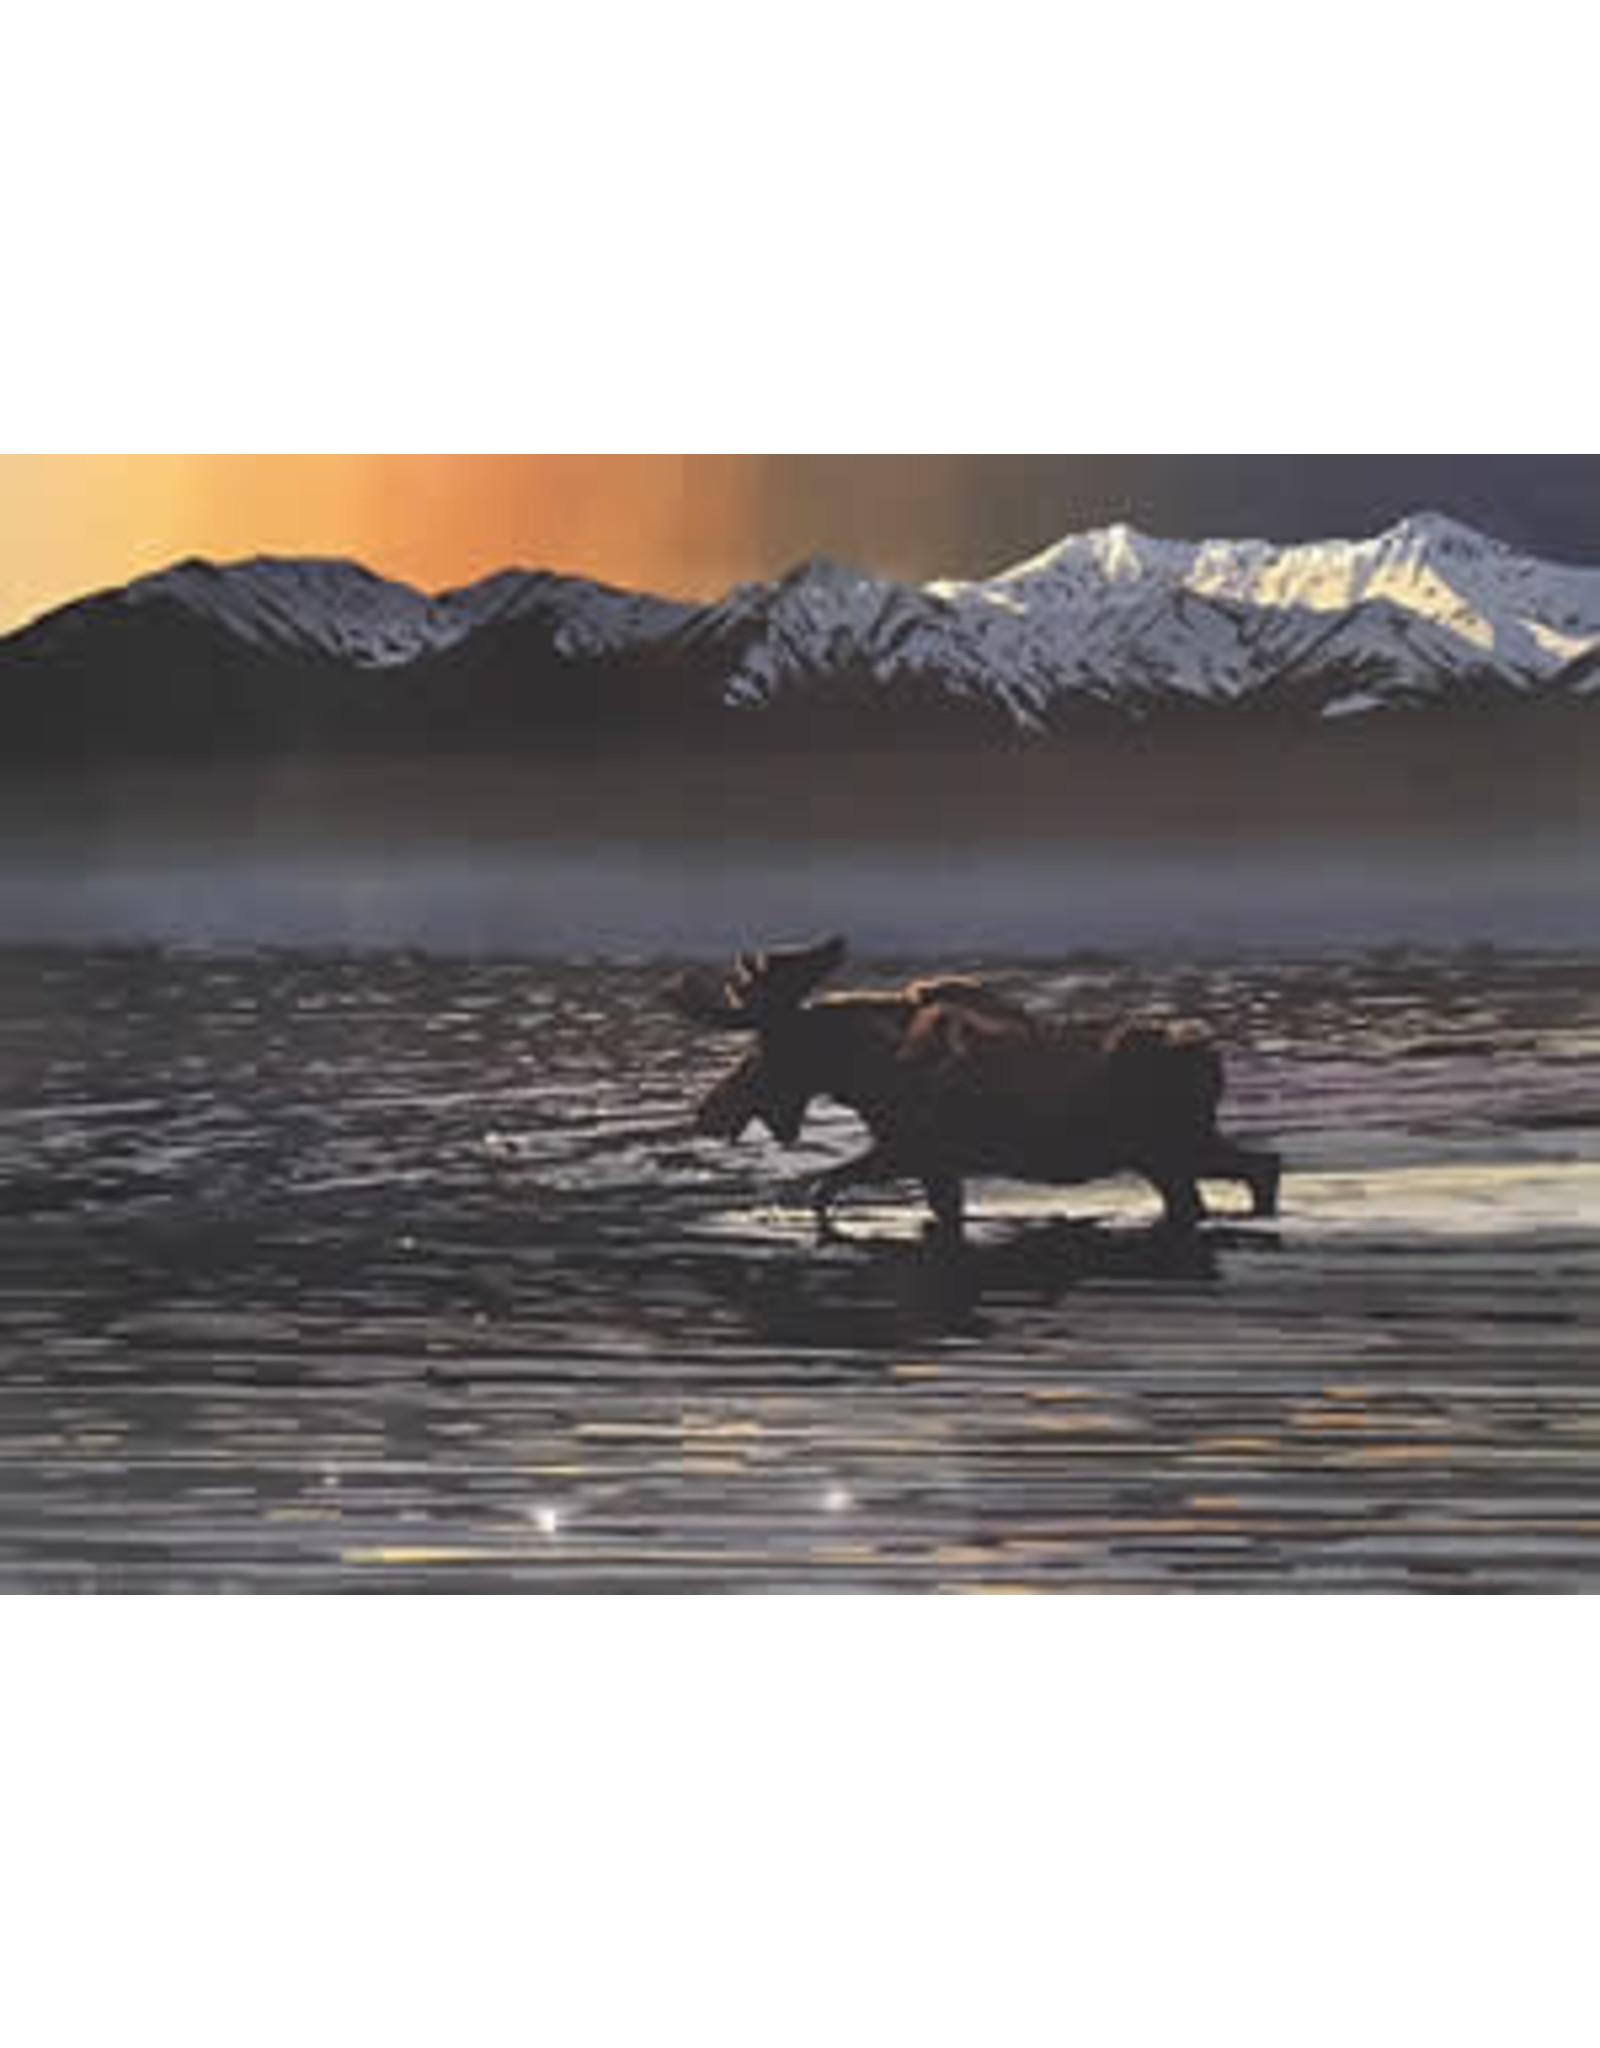 Byron Birdsall Morning Meander | Byron Birdsall